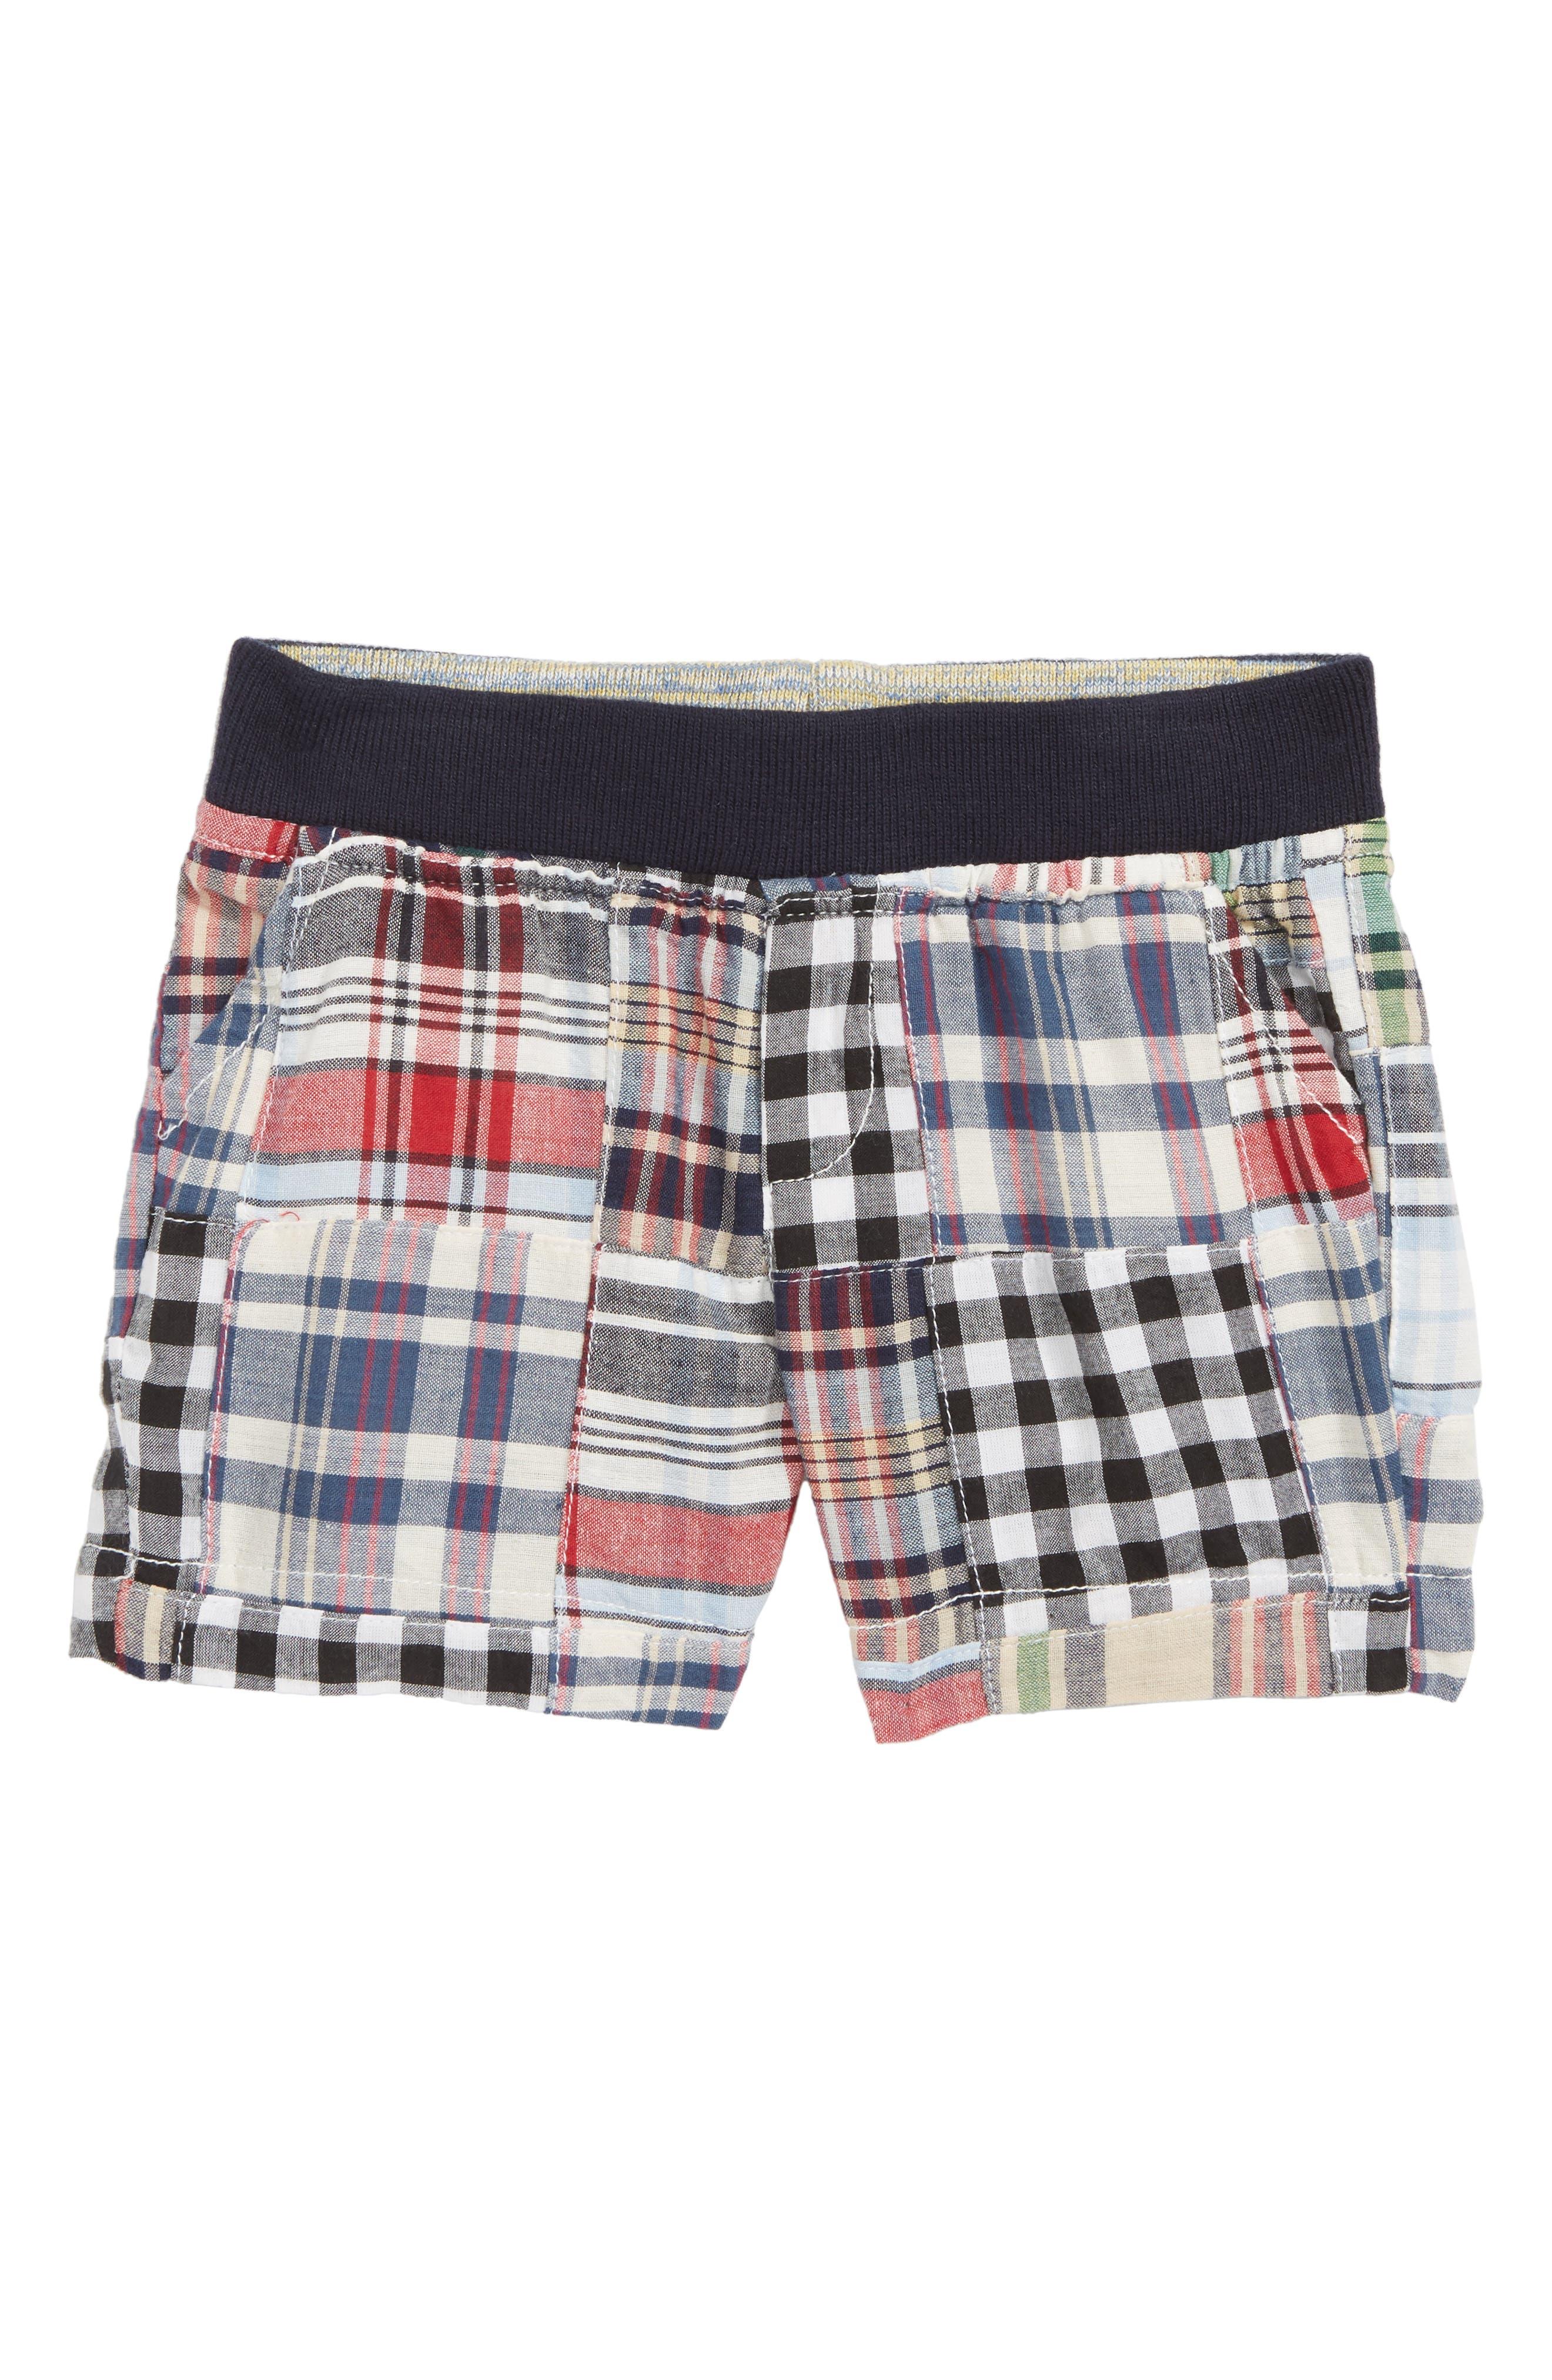 Peek Maxwell Patchwork Plaid Shorts (Baby Boys)